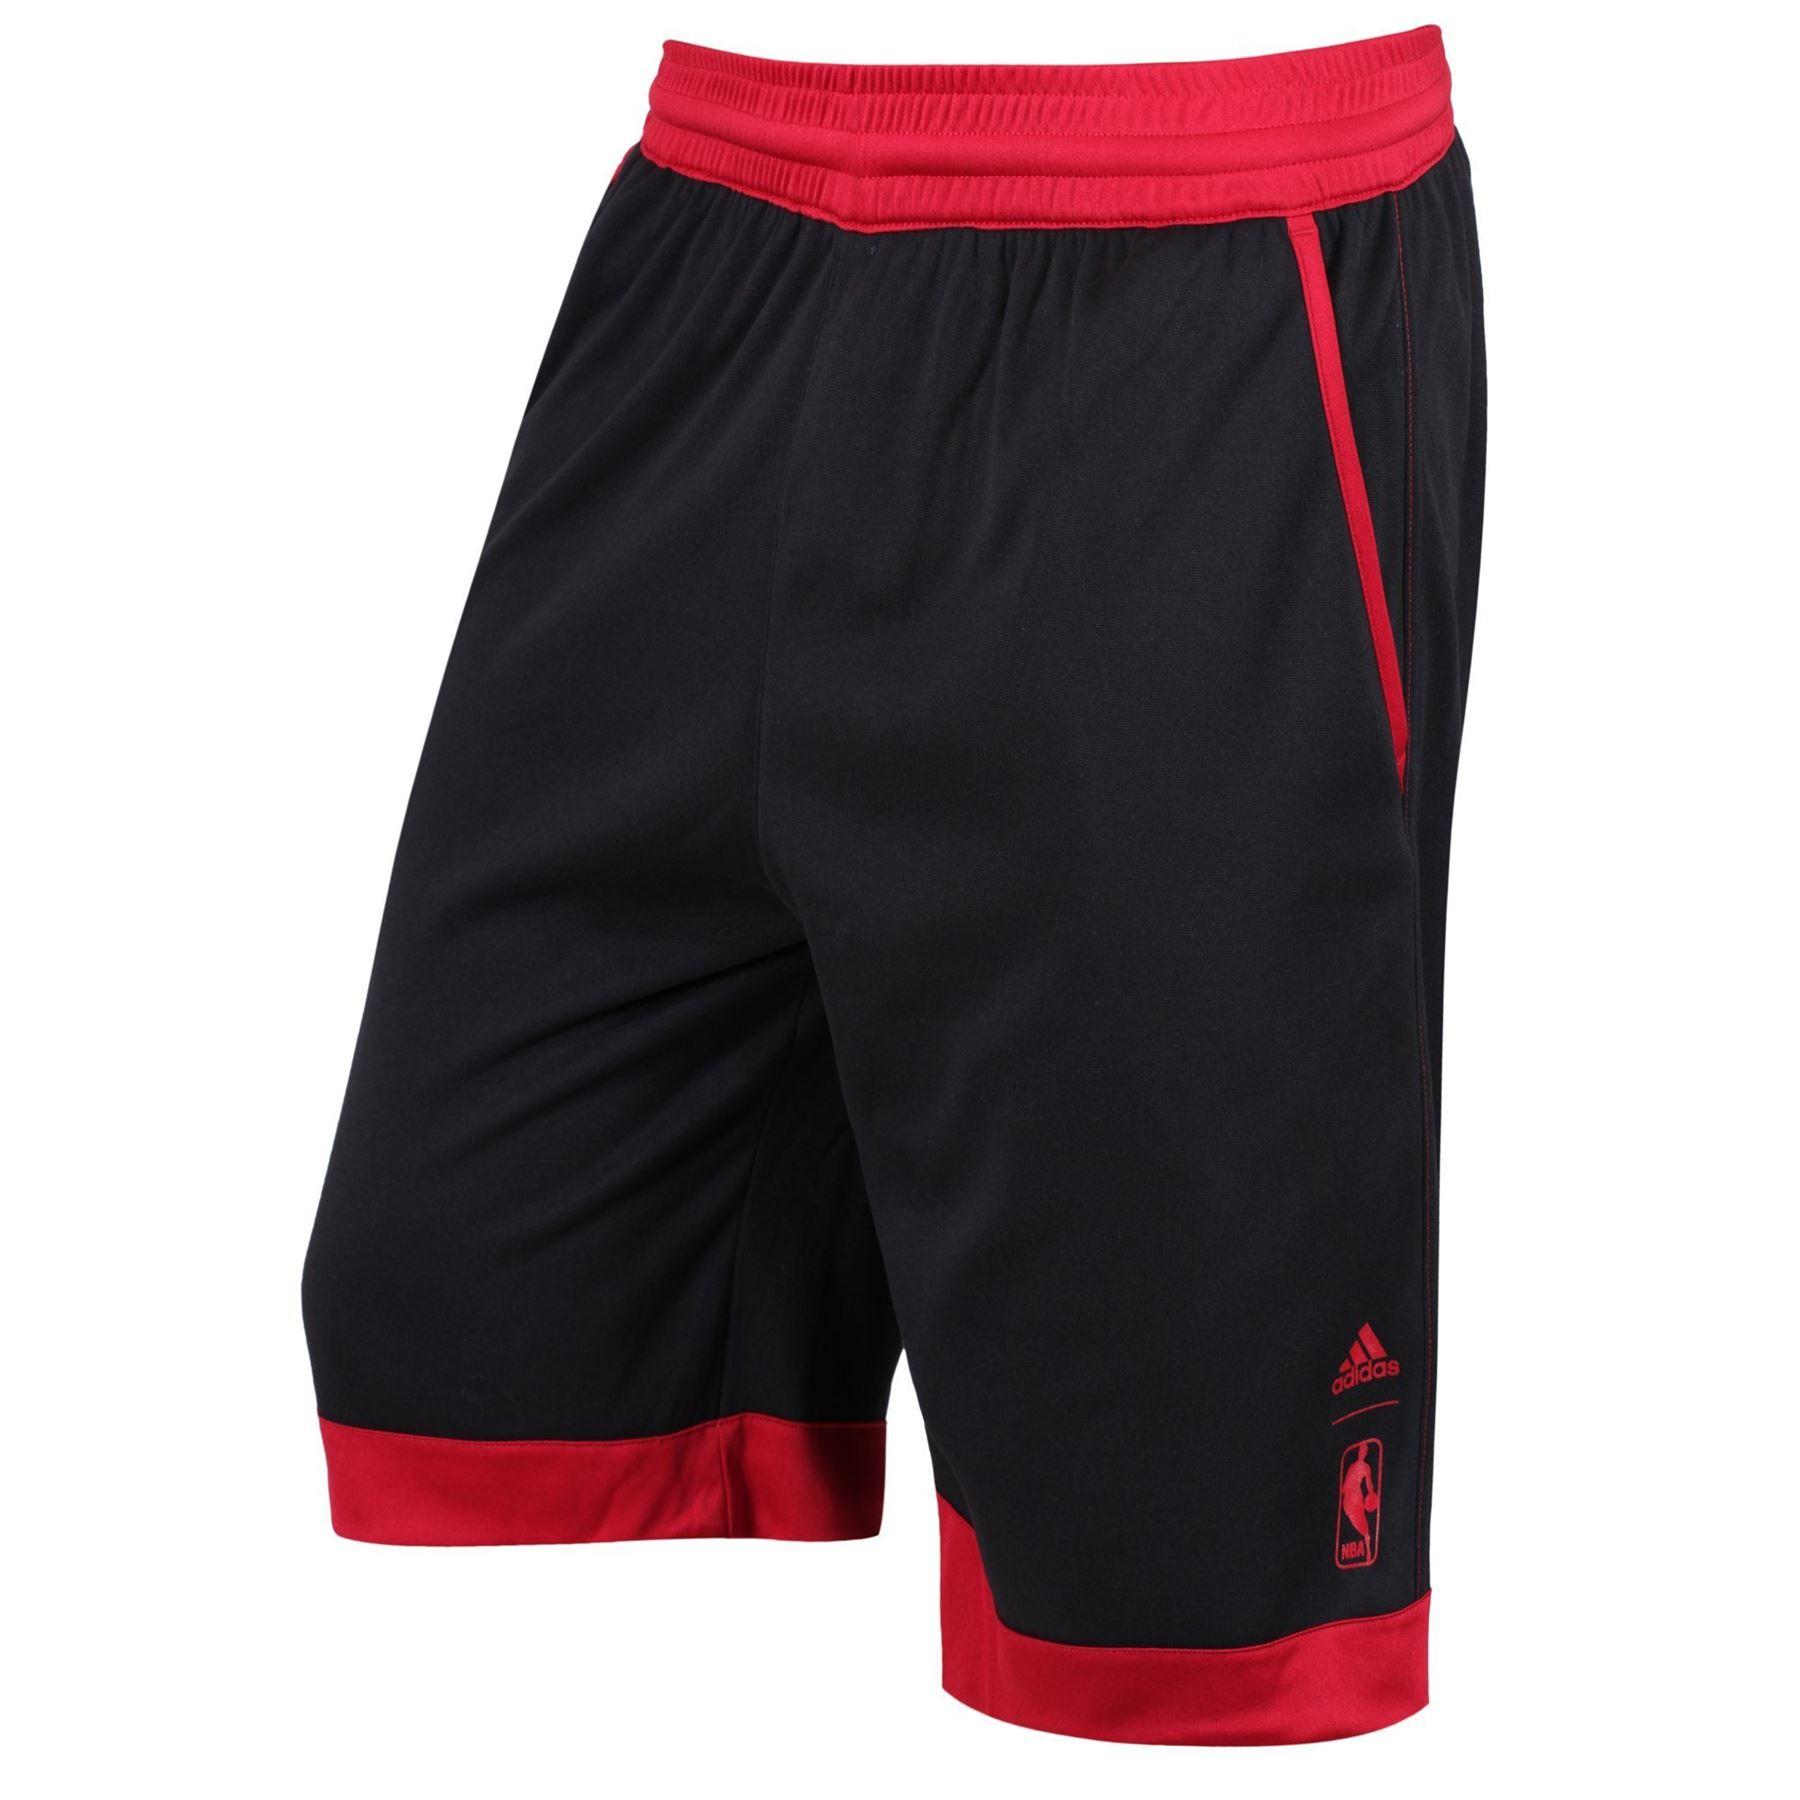 ea1d1086dfe3 ... cheap adidas miami heat jersey shorts black basketball summer beach  holidays 45db8 5cdc5